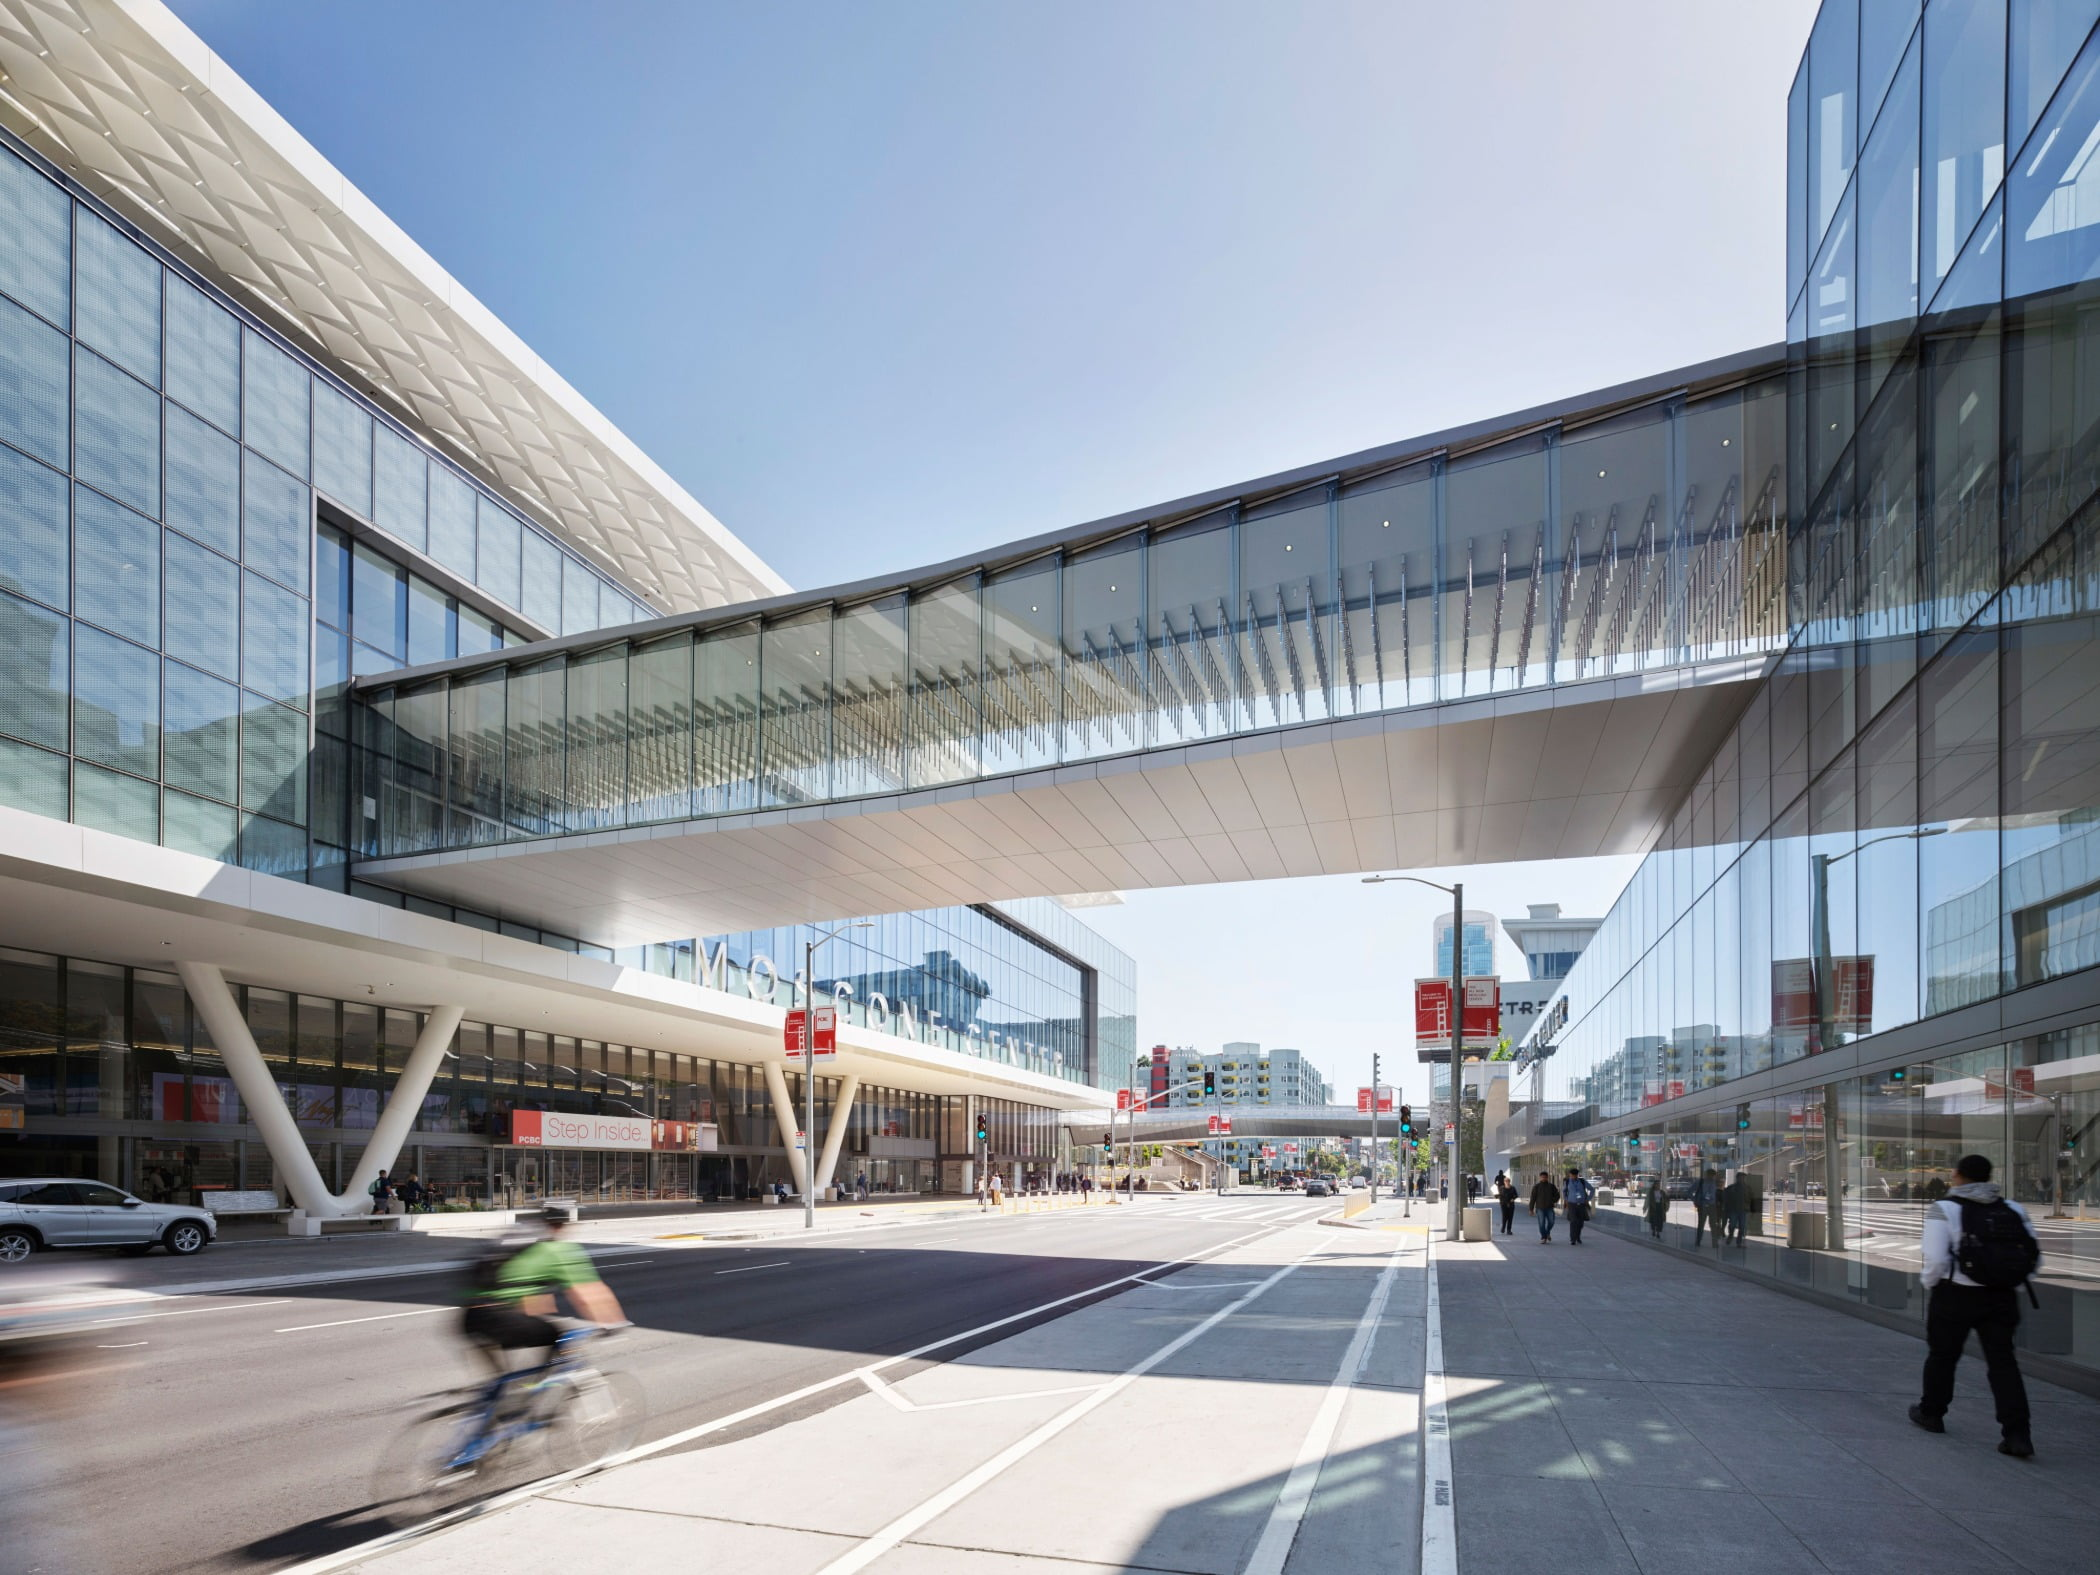 Metropolitan area, Skyway, Building, Architecture